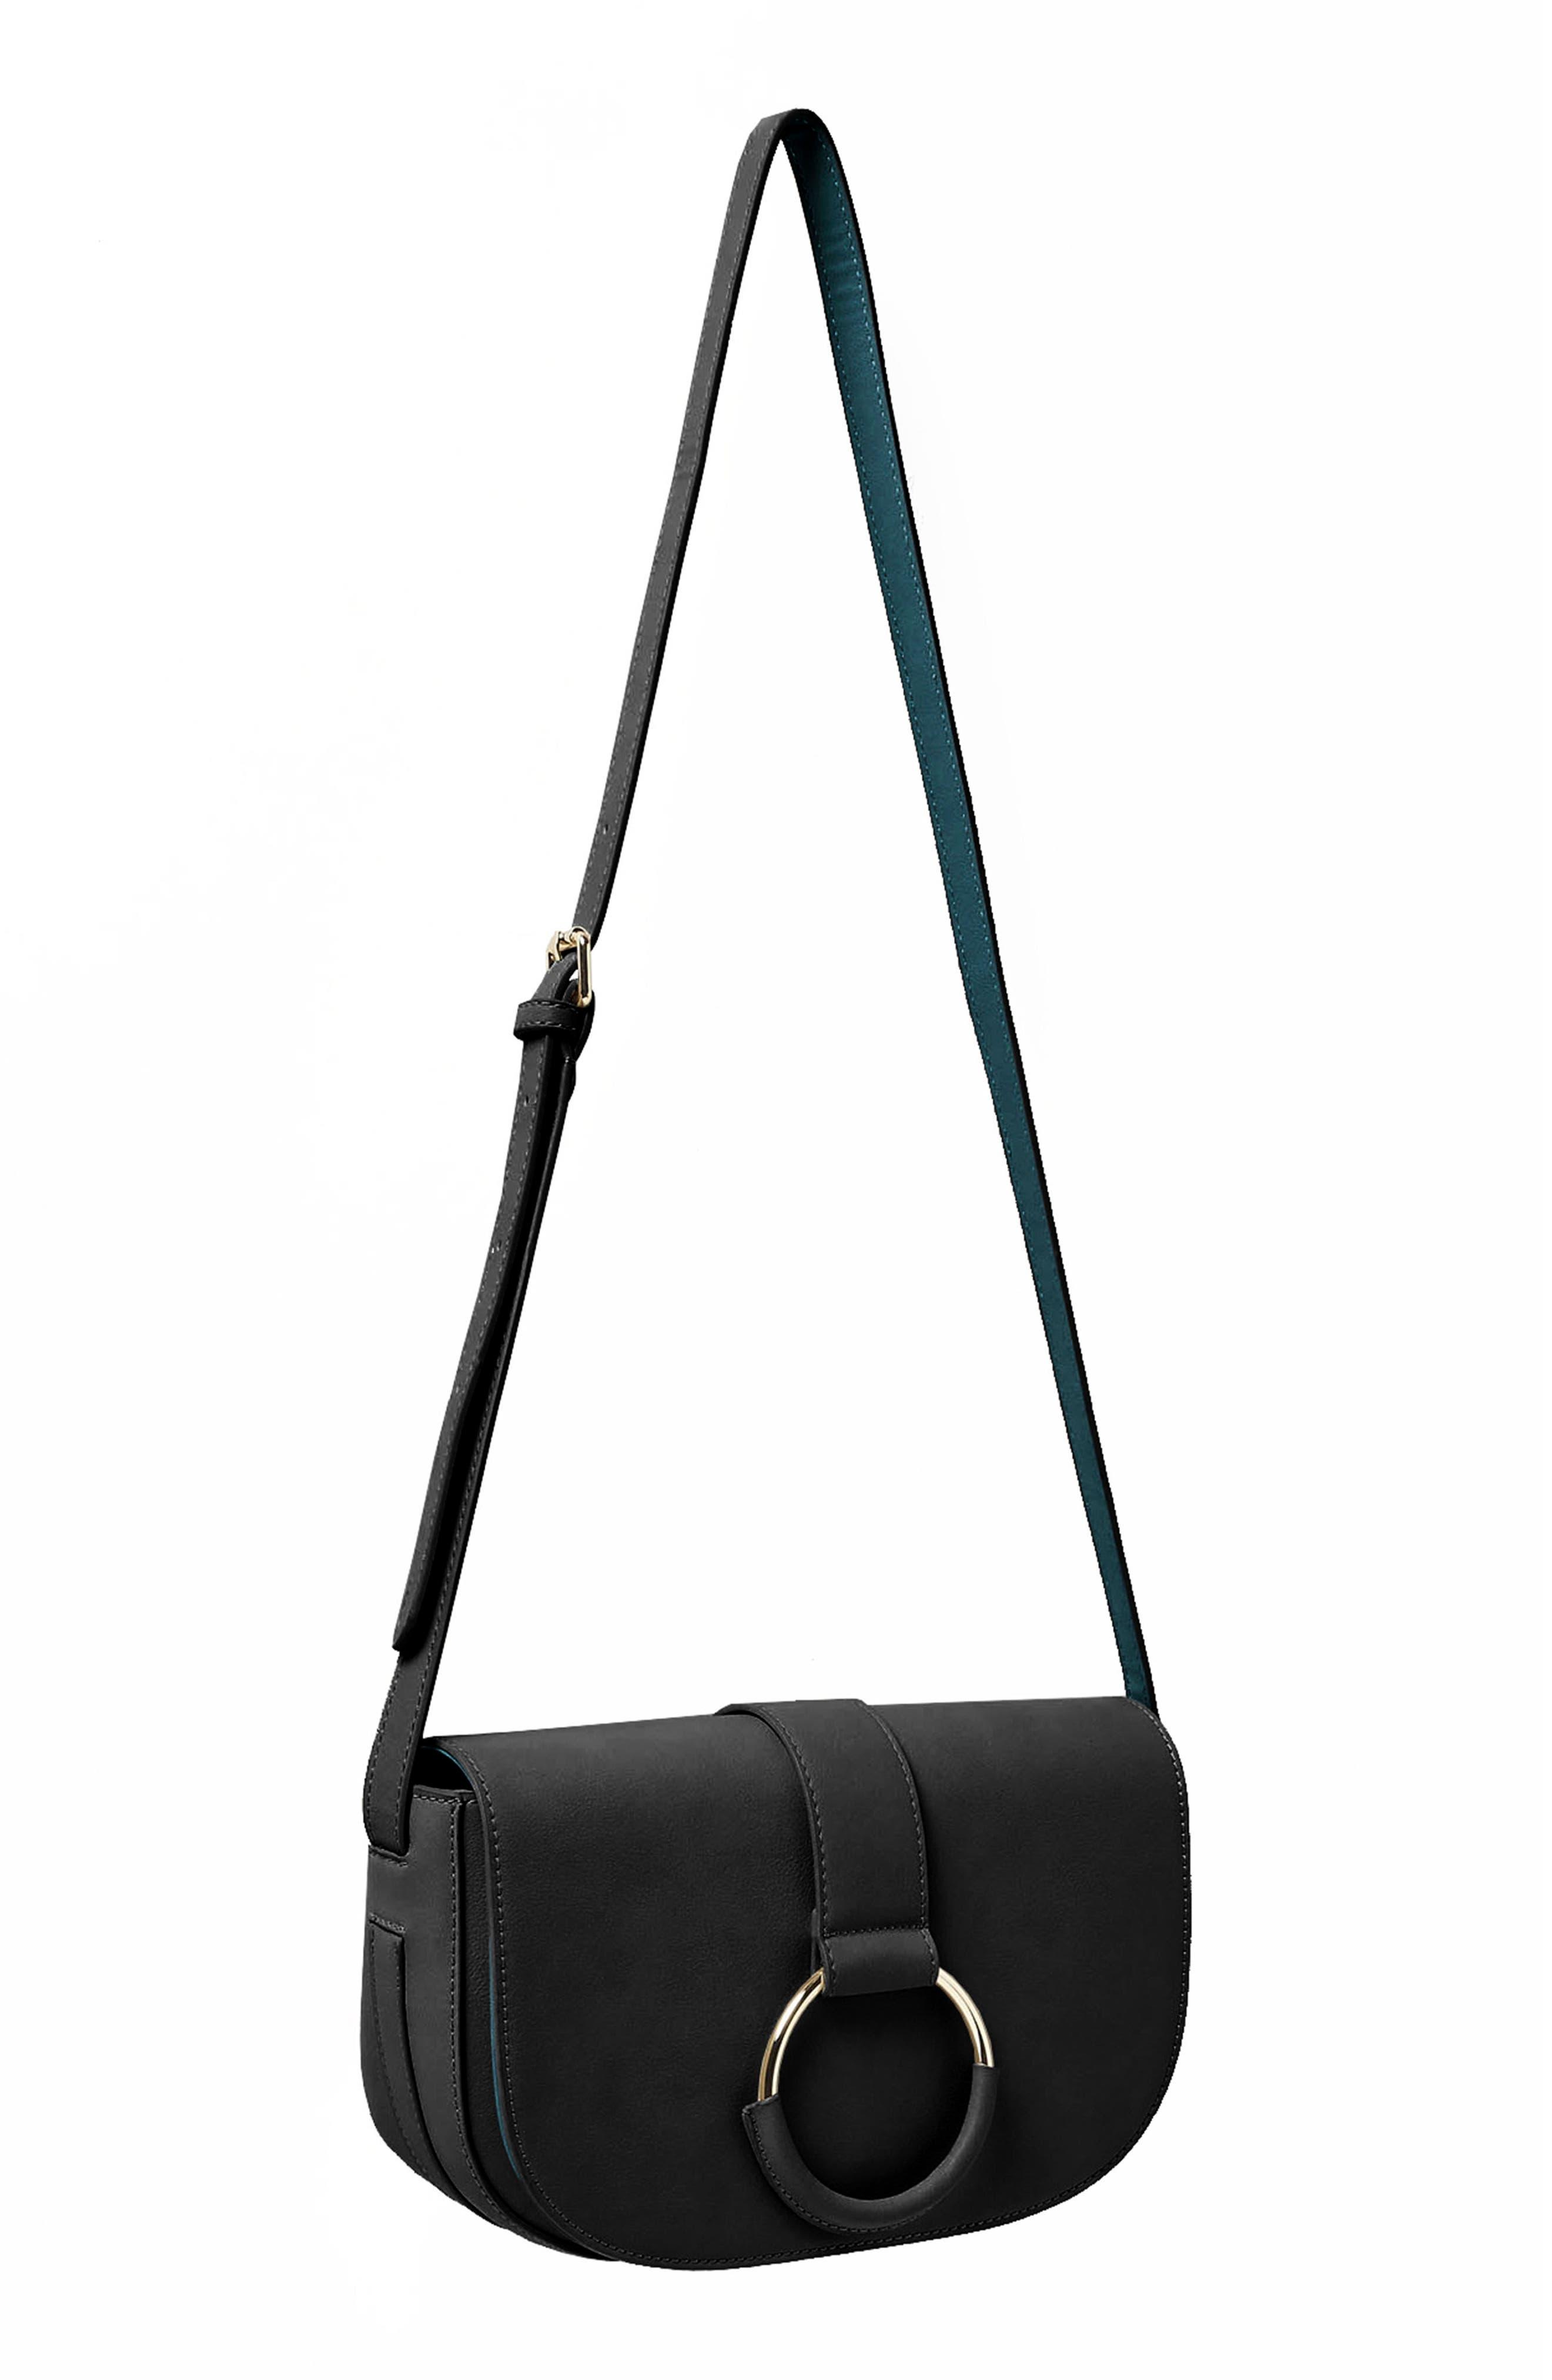 URBAN ORIGINALS,                             Lolita Vegan Leather Crossbody Bag,                             Alternate thumbnail 3, color,                             001